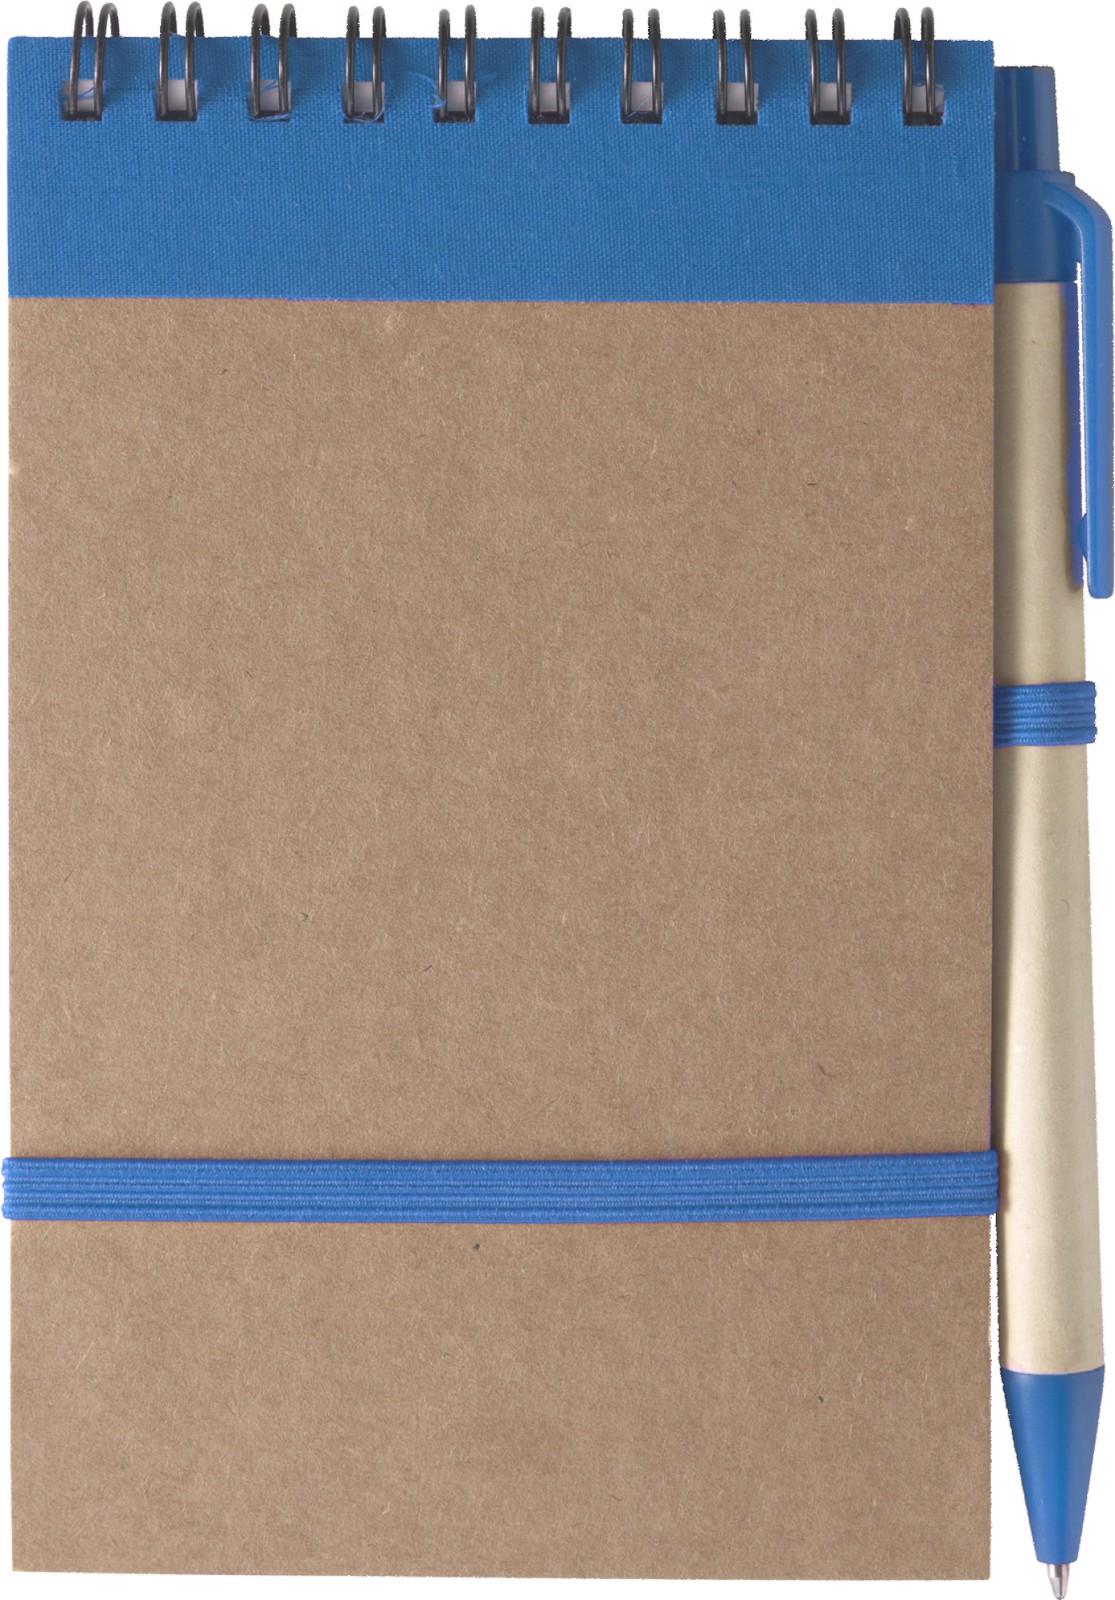 Cardboard notebook - Light Blue